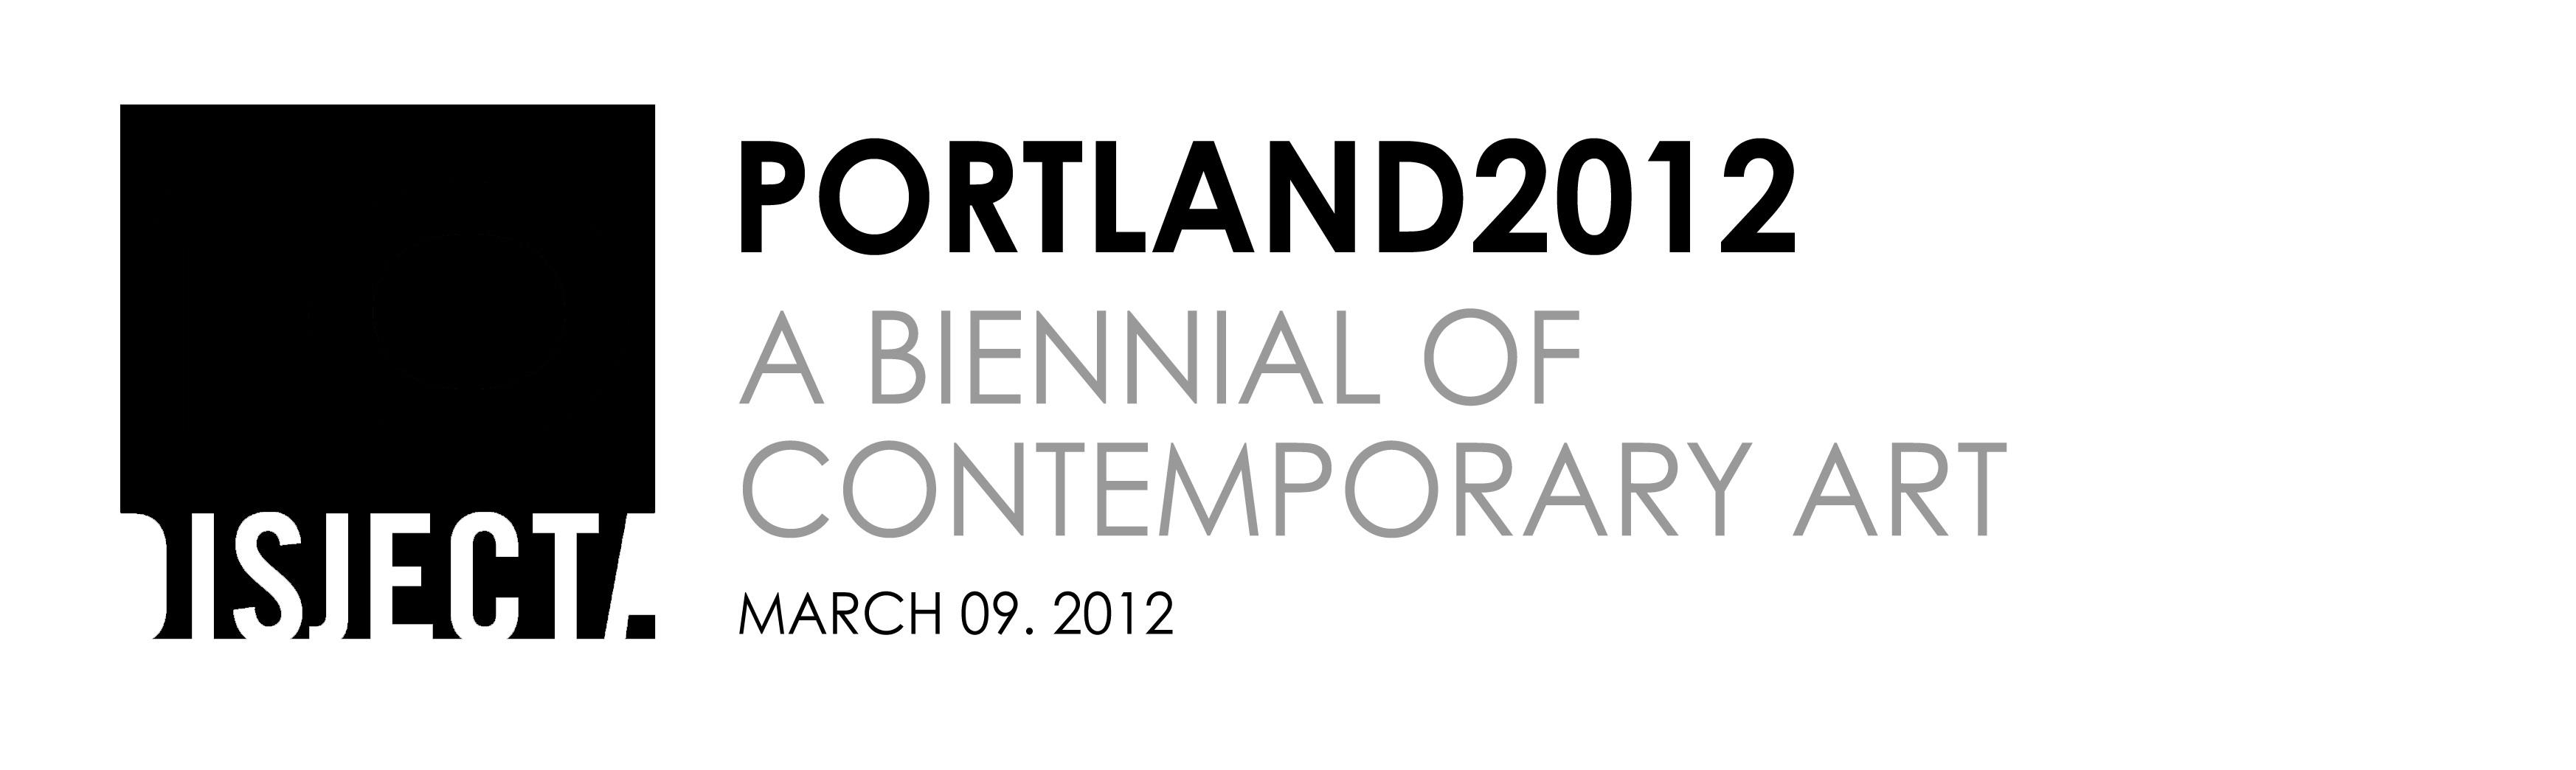 disjecta_logo_biennial2012.jpg